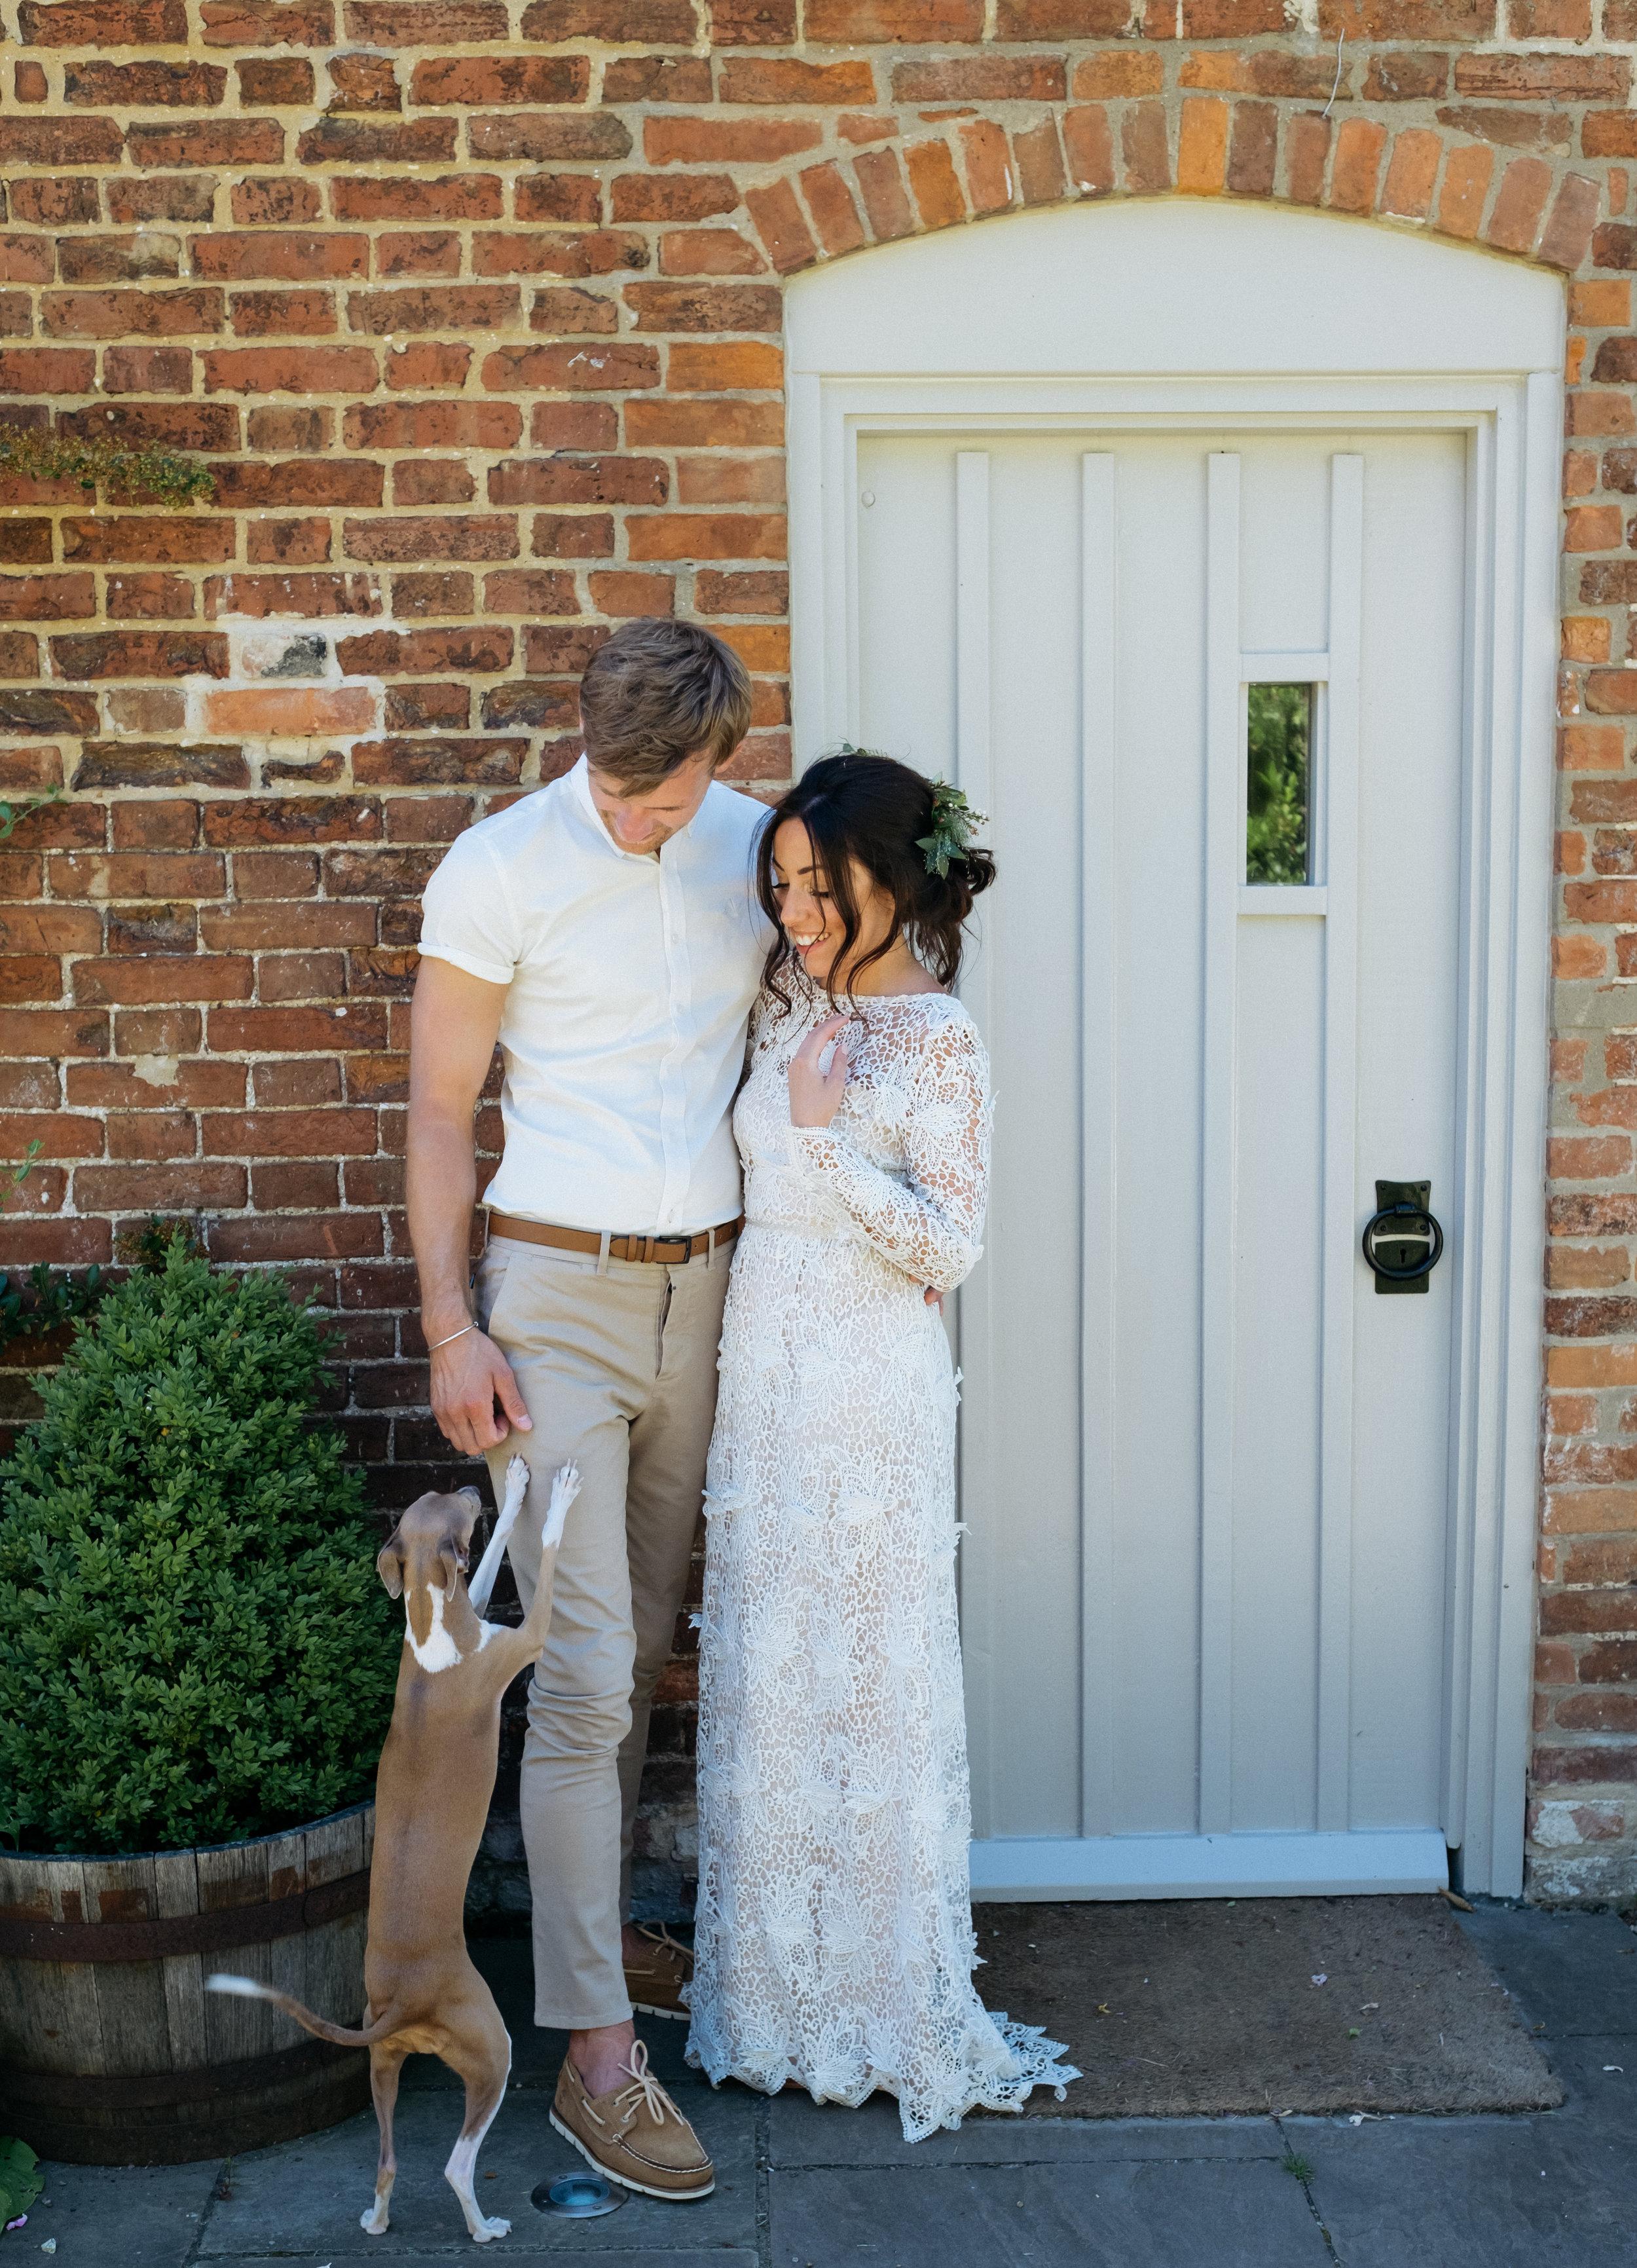 Italian greyhound with bride and groom